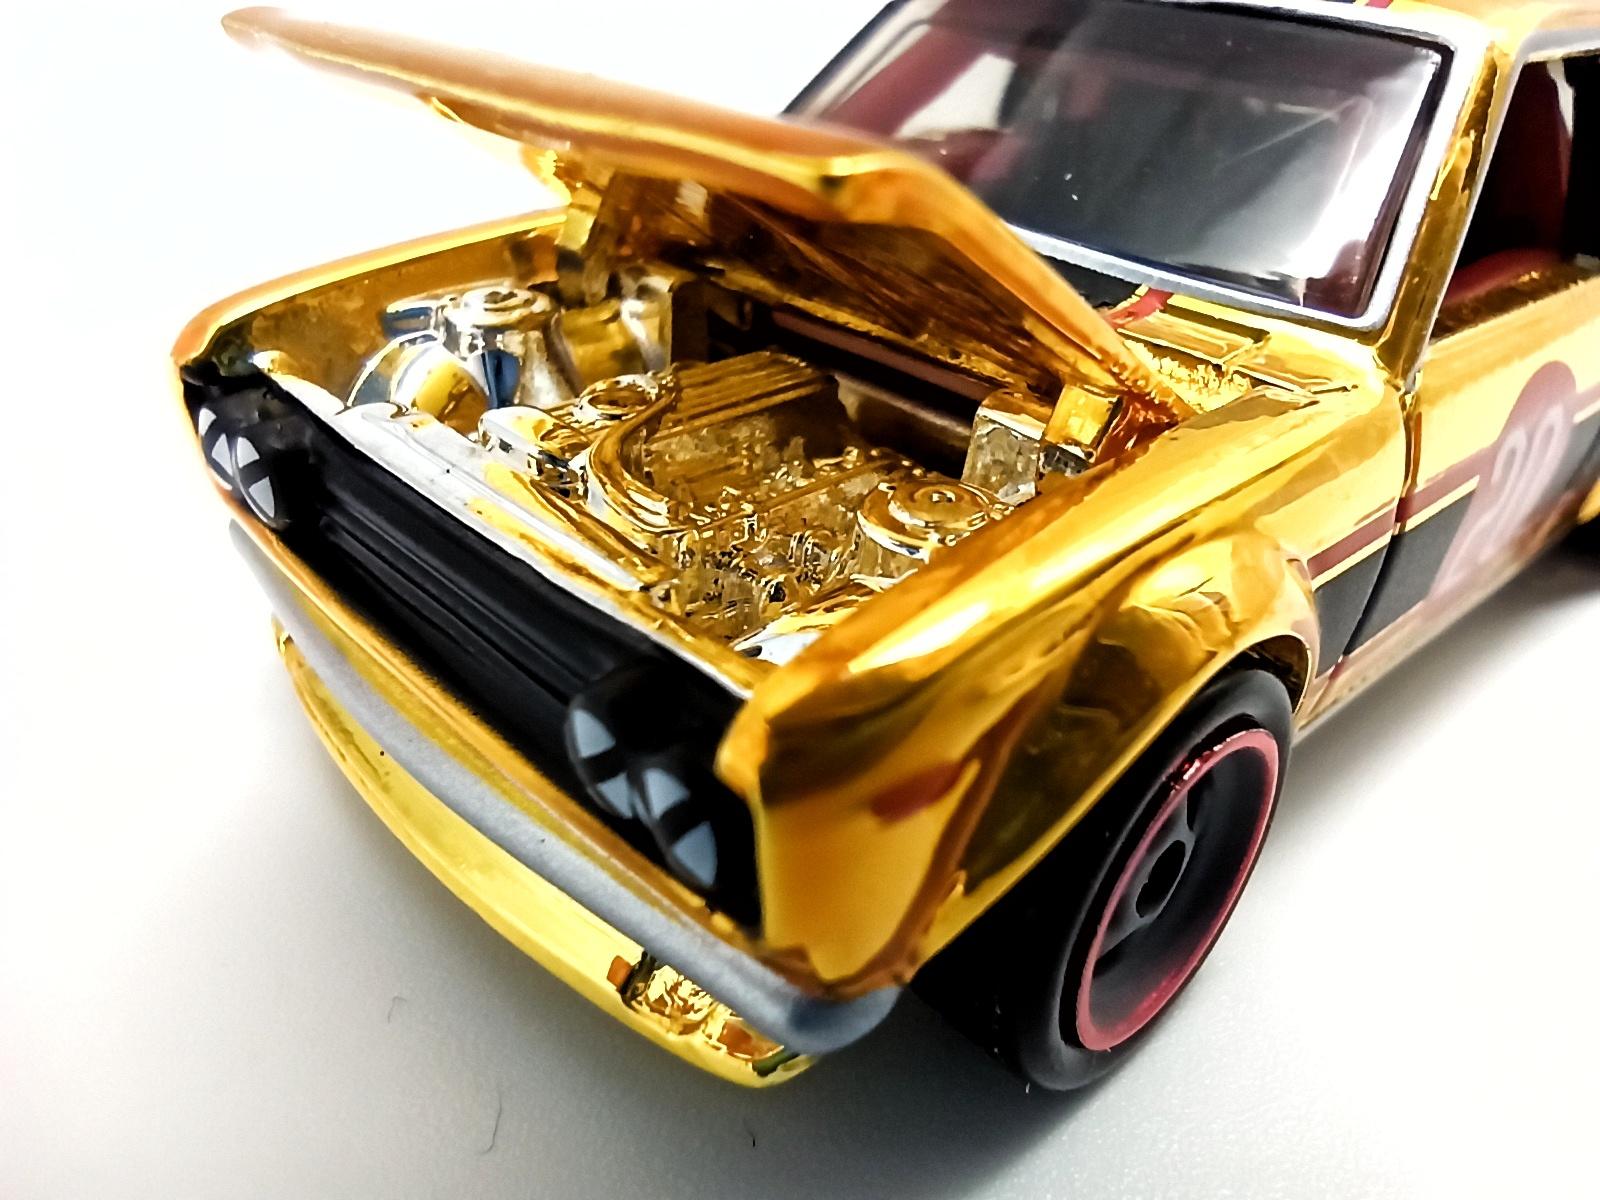 Hot Wheels Datsun Bluebird 510 (DTH32) 2020 RLC Exclusive (1 of 15.000) spectraflame bright yellow gold open hood